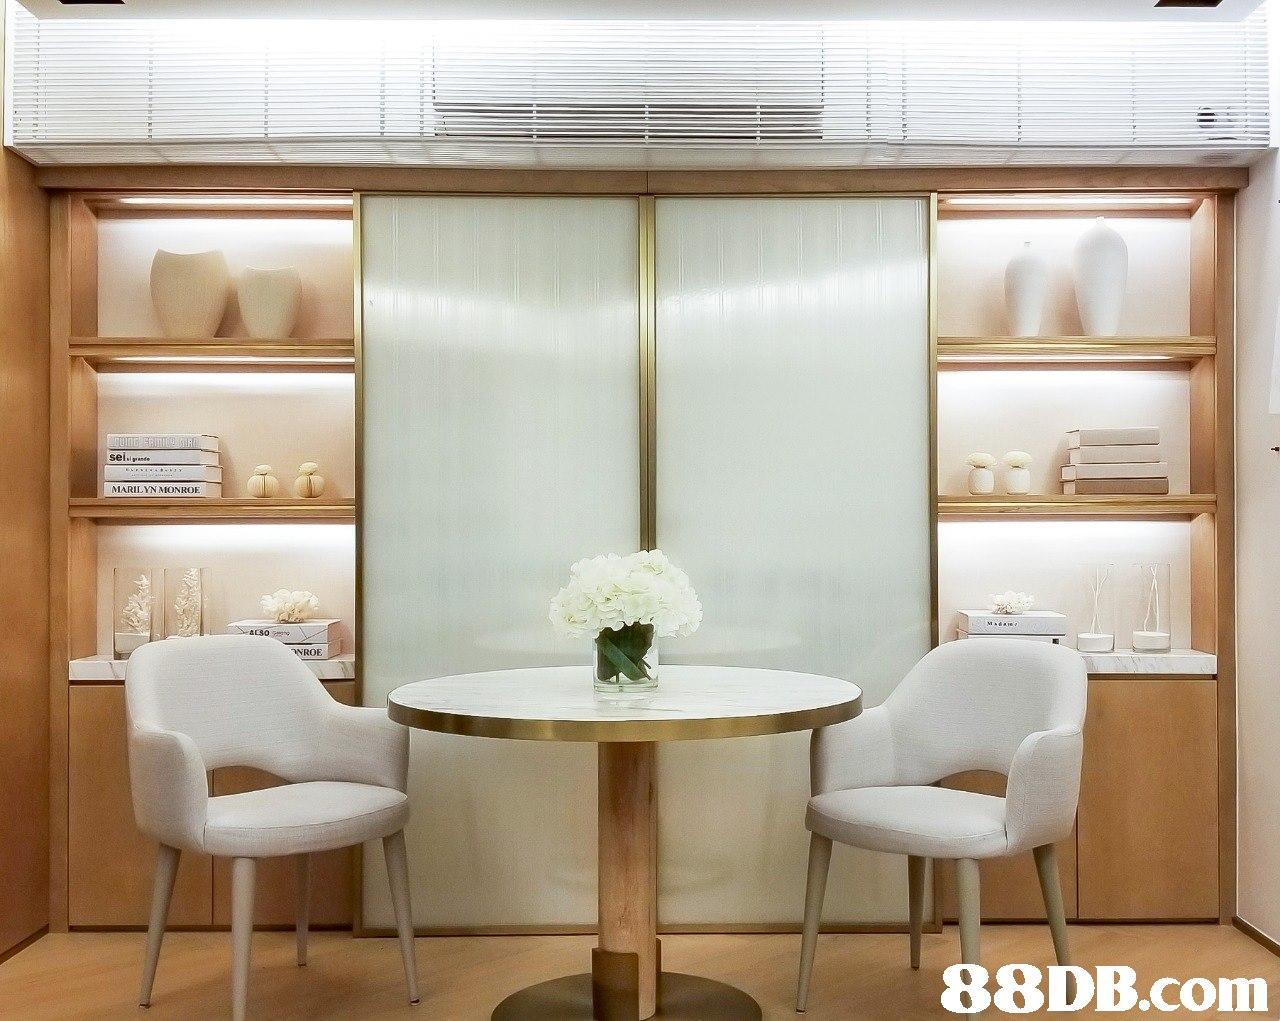 seile MARILYN MONROE NROE 88DB.com  interior design